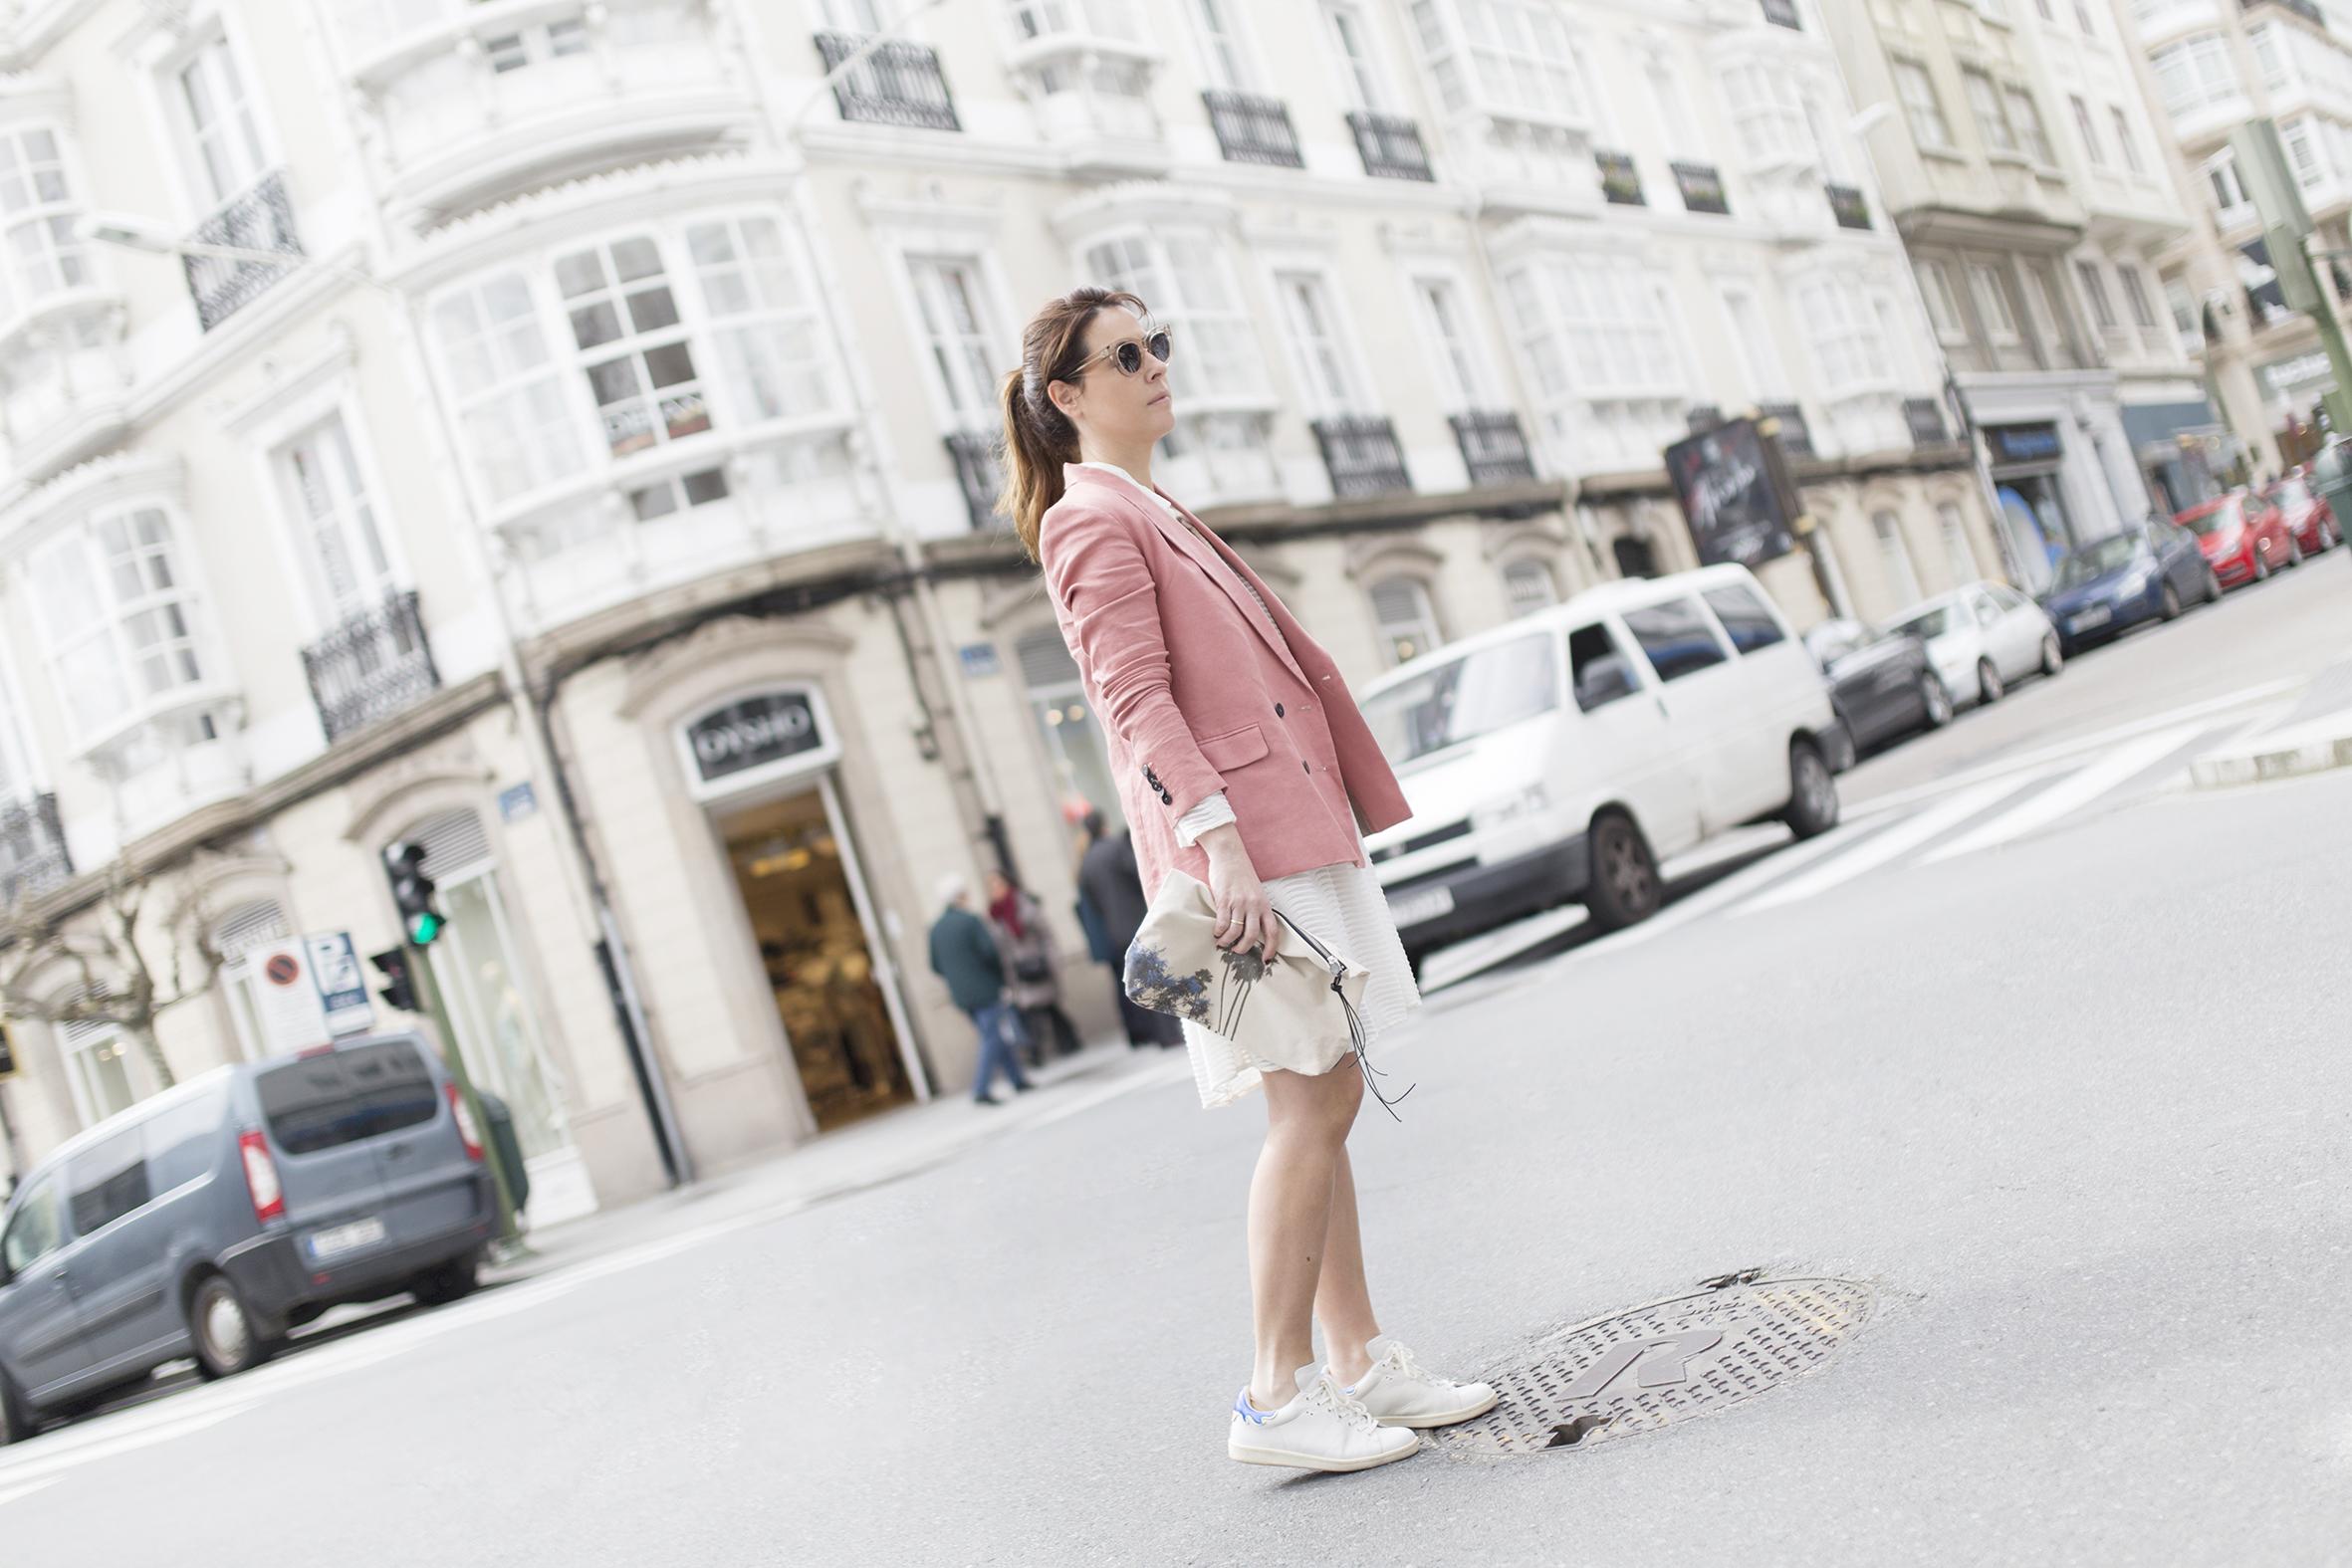 fashion- Coruña-Voglia-streetstye-descalzaporelparque-Silver Lake Zubi-Mango blazer